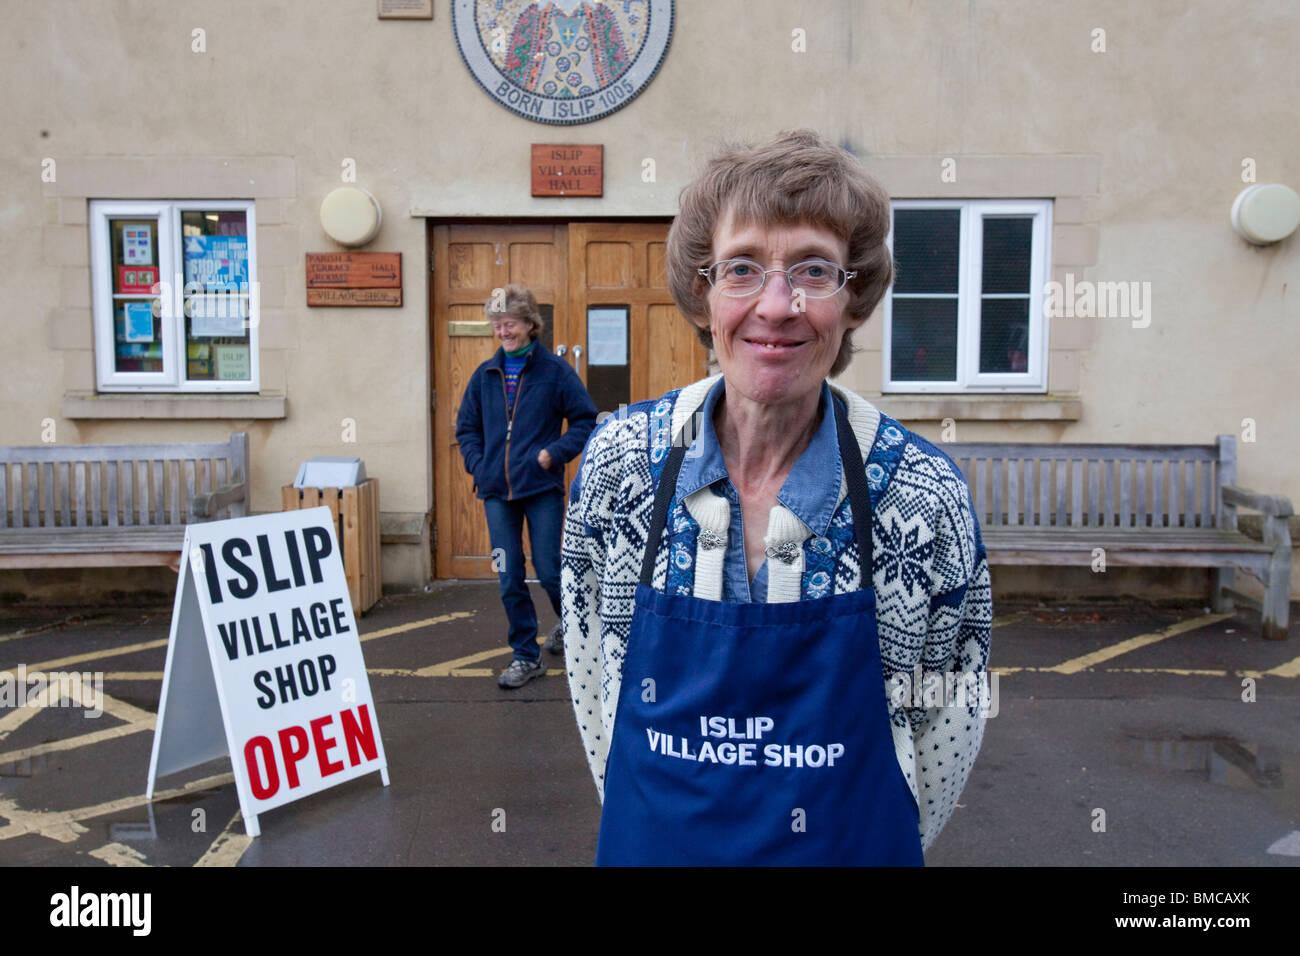 Maralynn Smith who runs Islip Village shop based in the Islip Village hall, Oxfordshire - Stock Image